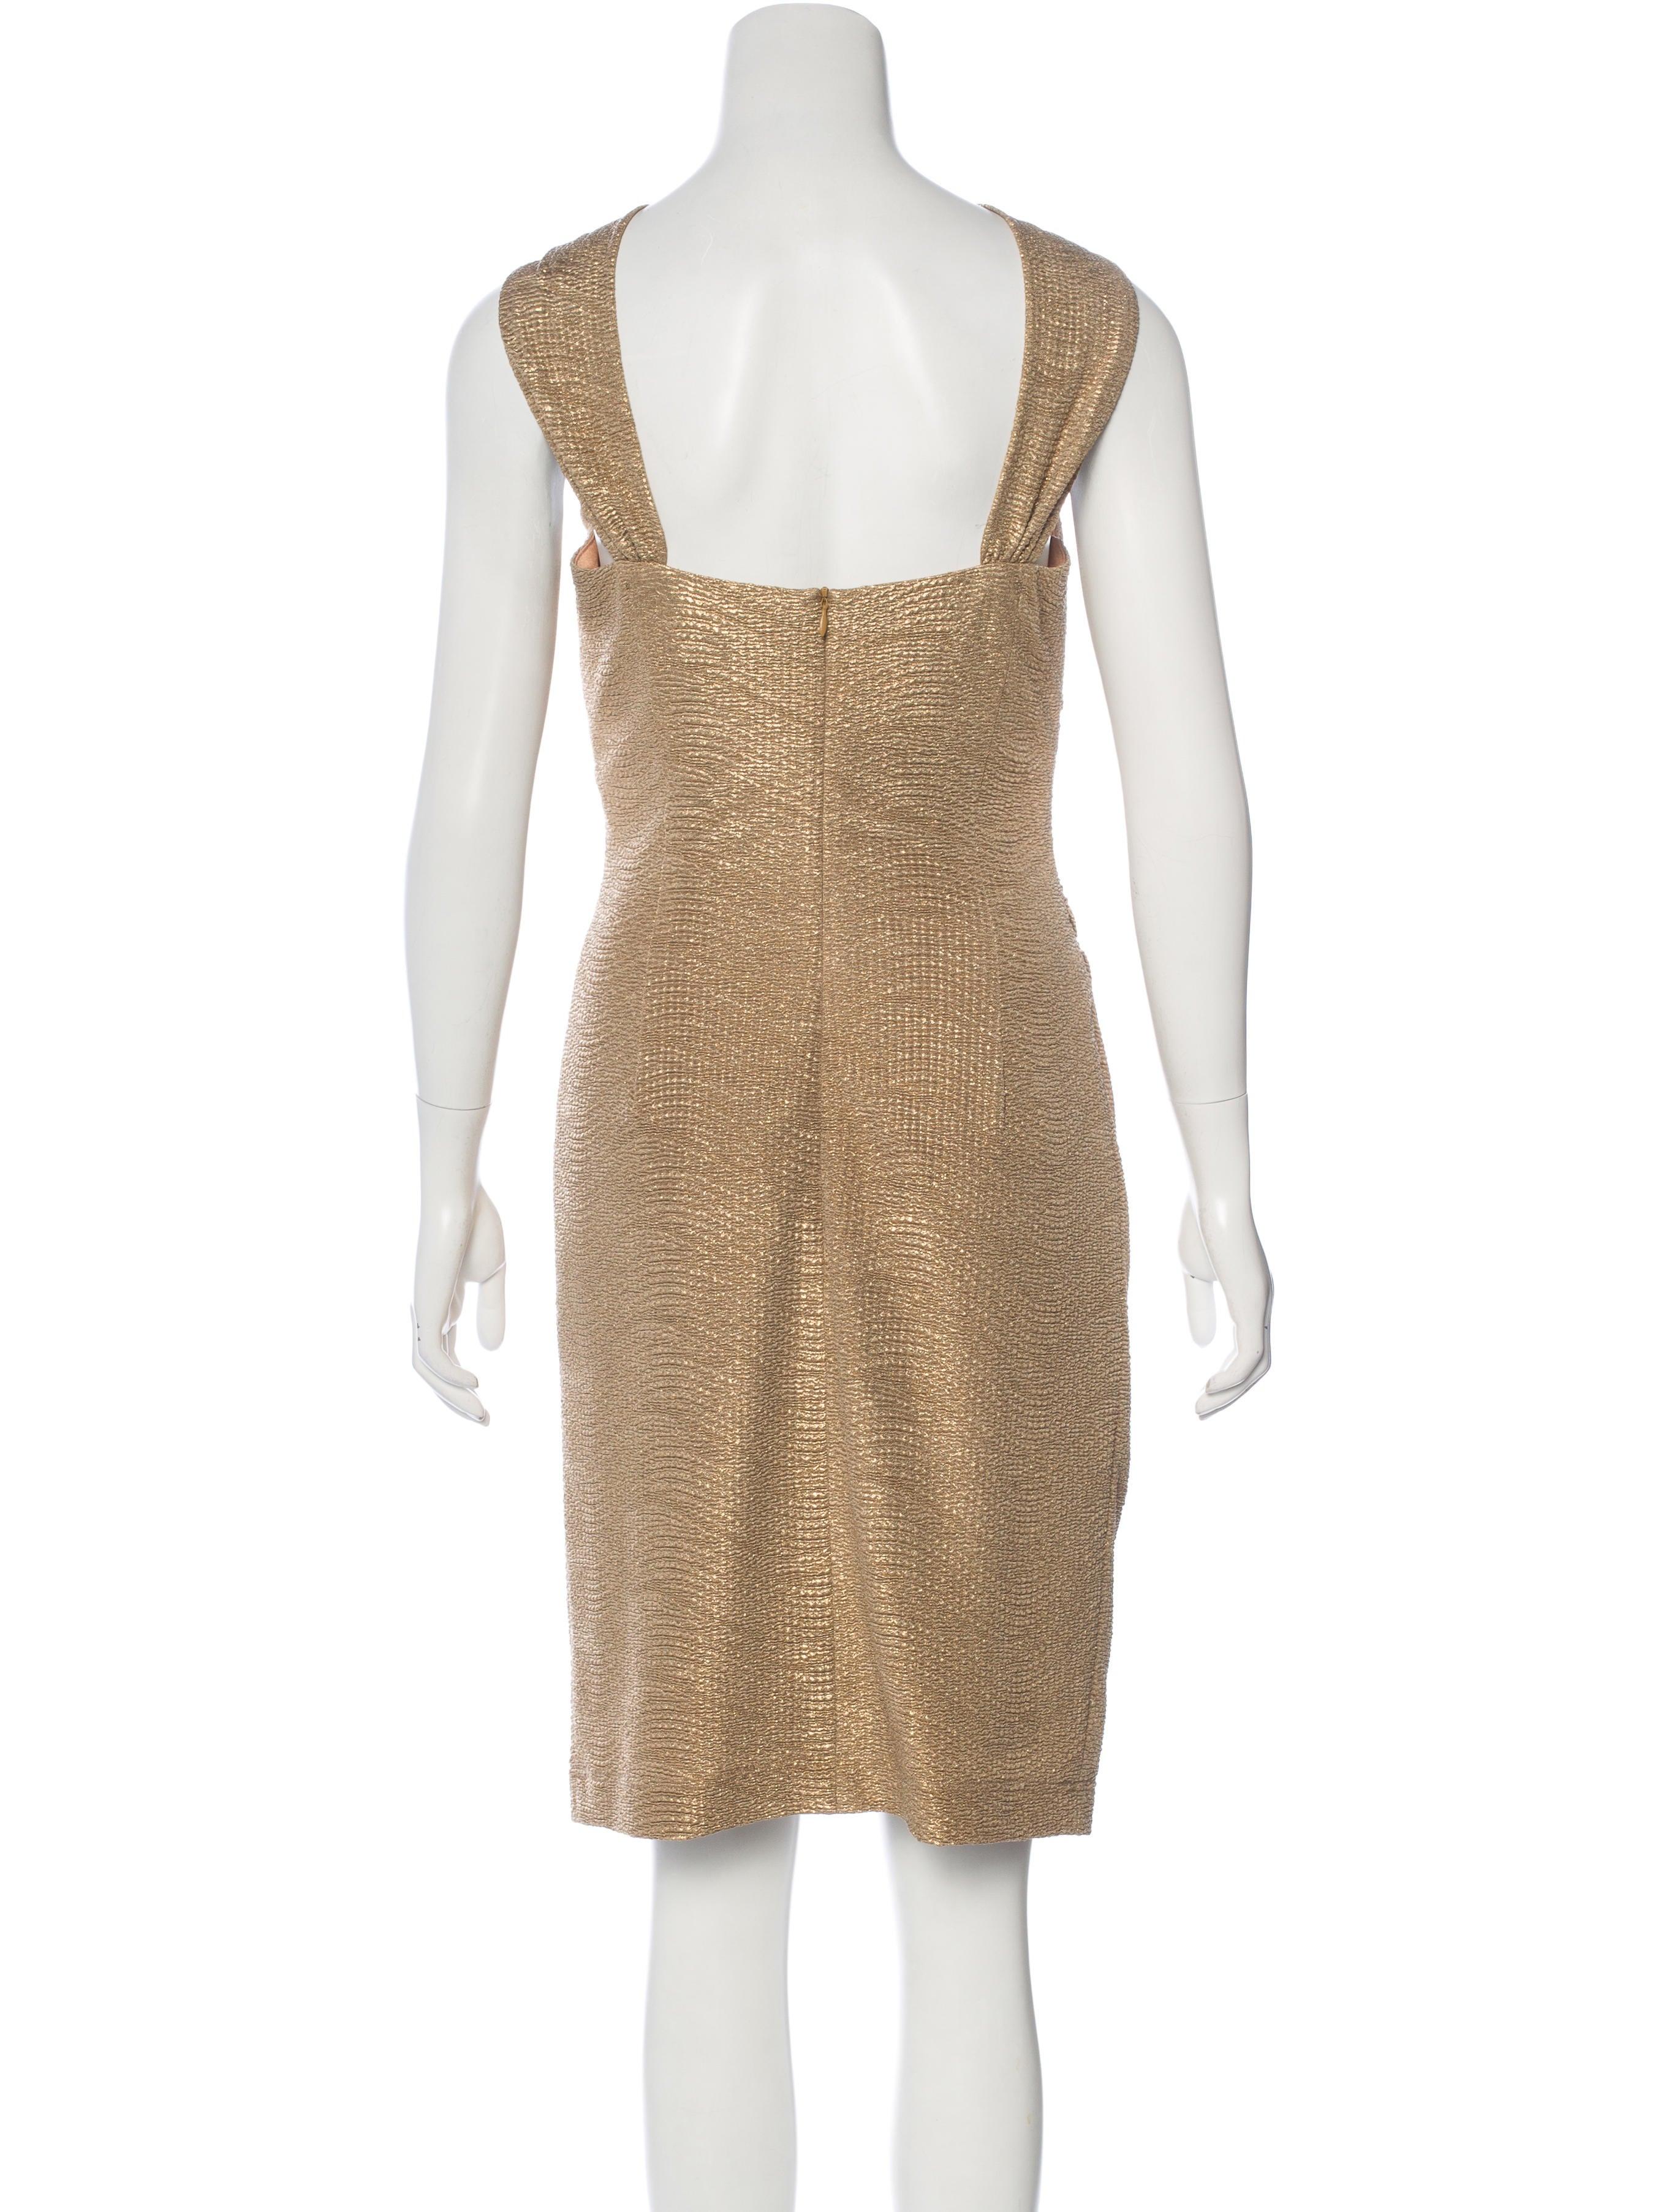 david meister bead embellished metallic dress dresses